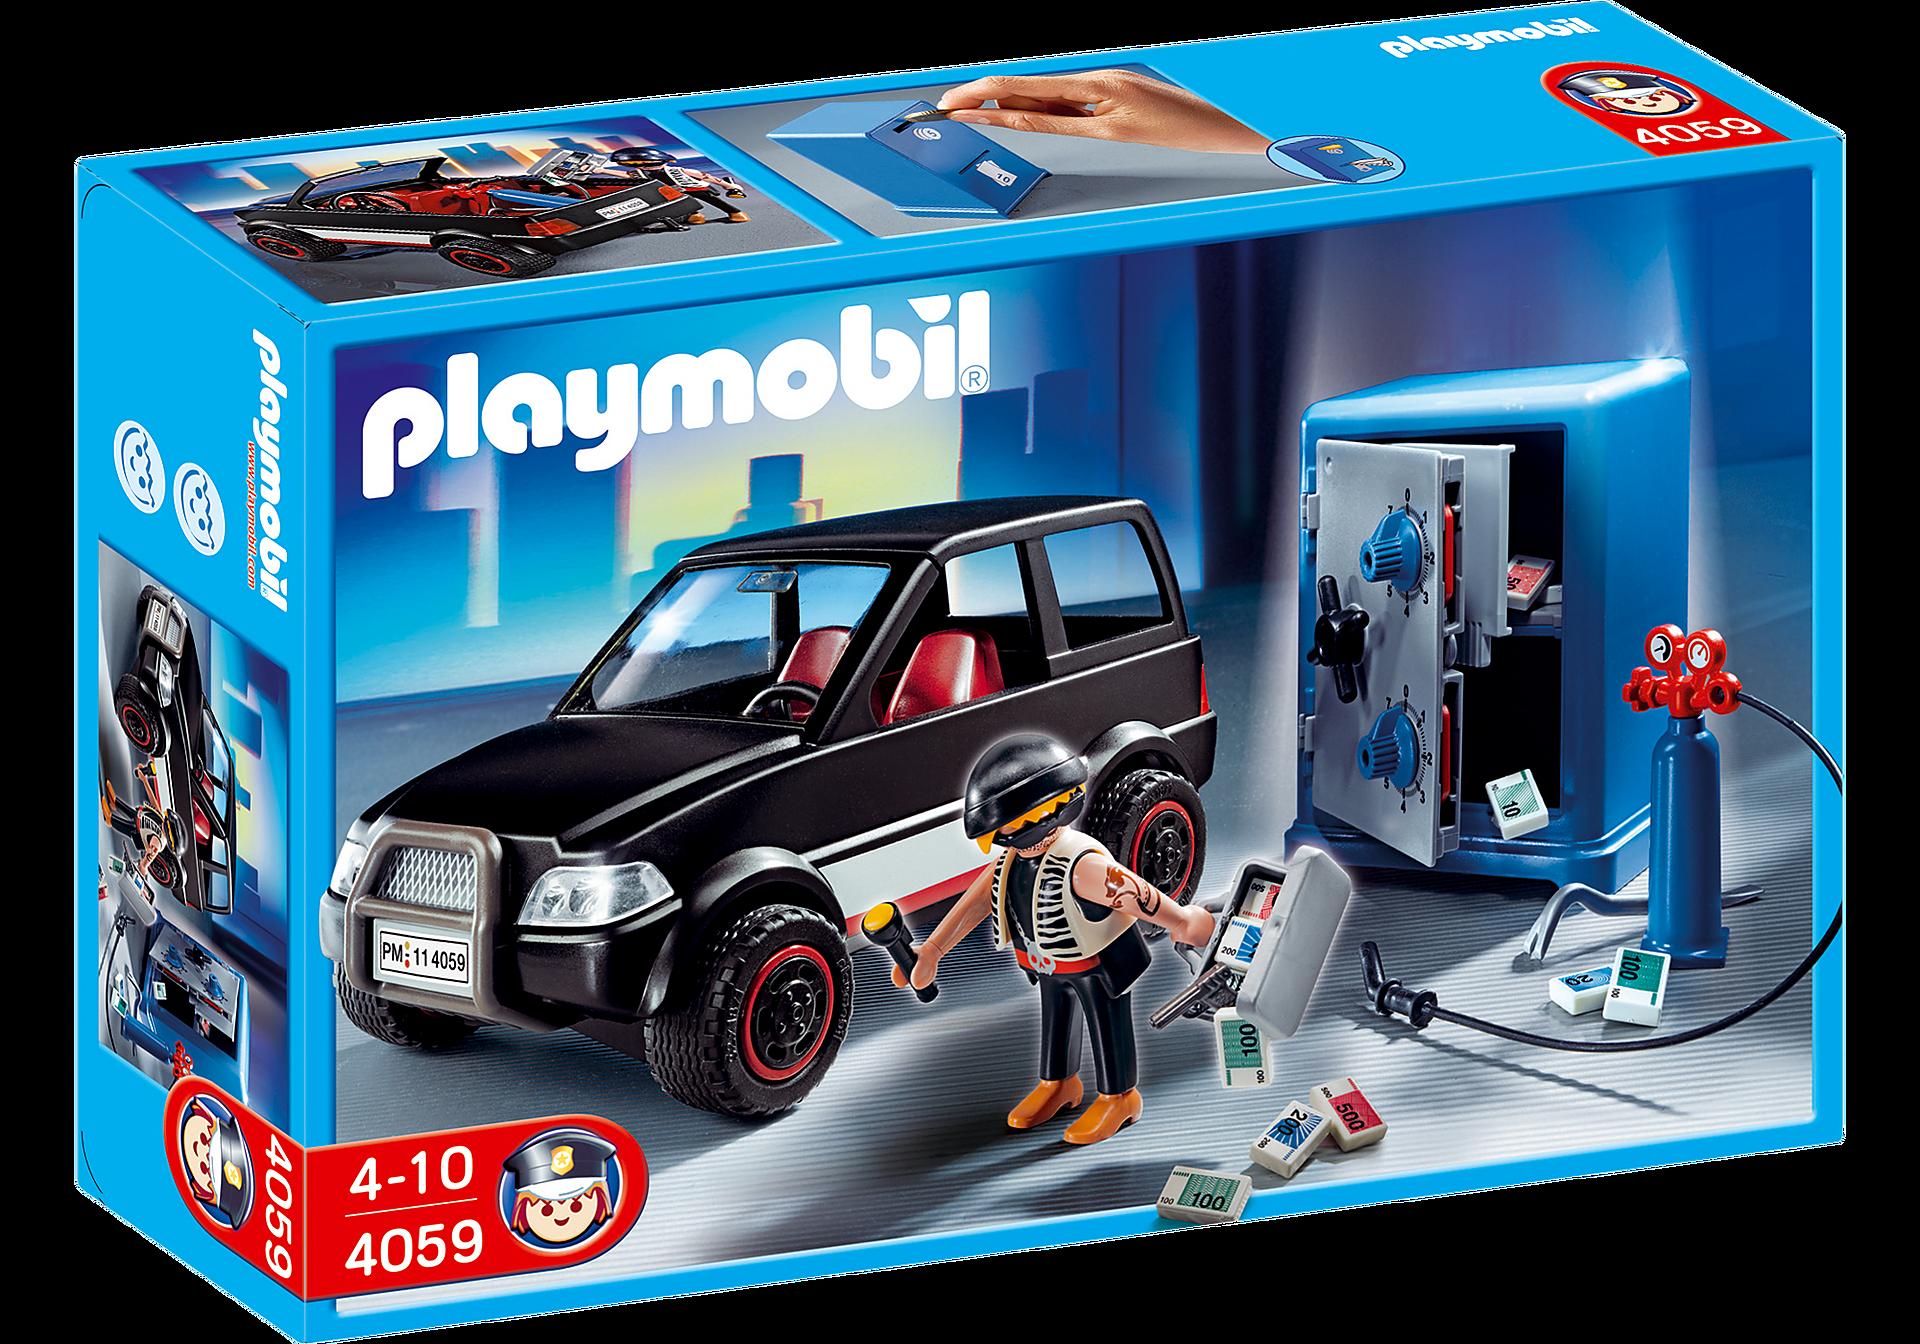 http://media.playmobil.com/i/playmobil/4059_product_box_front/Brandkastkraker met vluchtauto